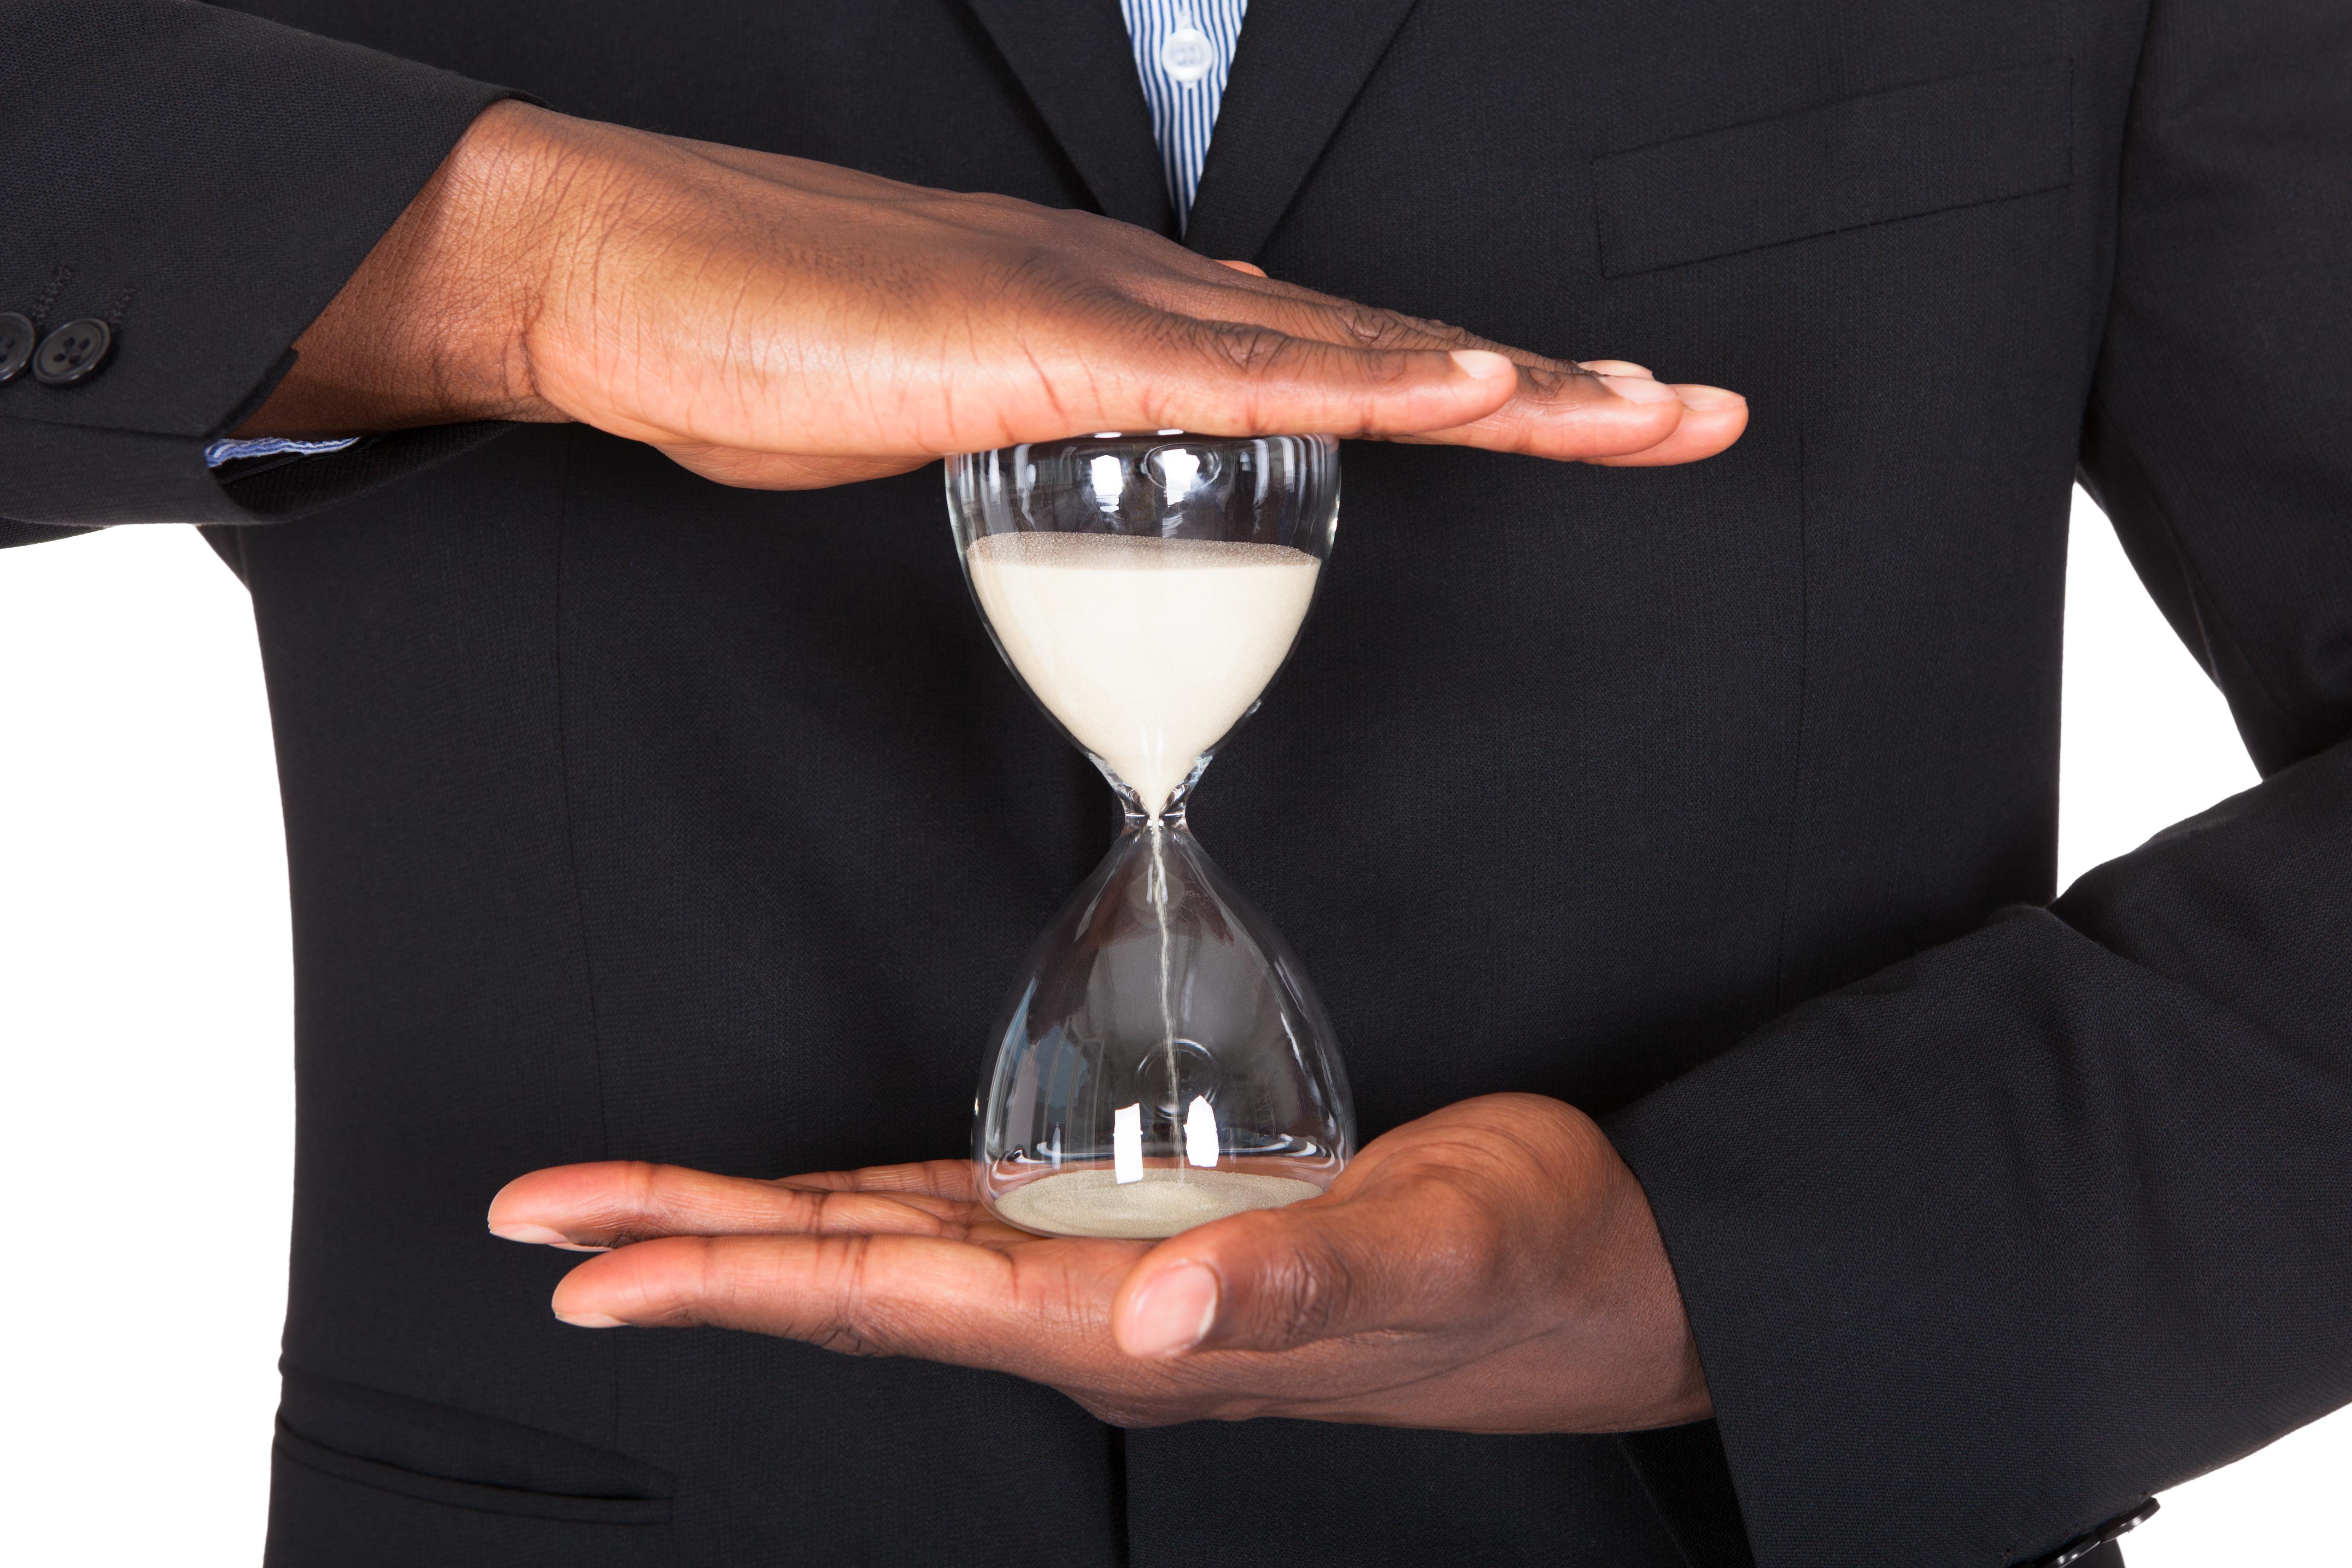 Hands holding hourglass